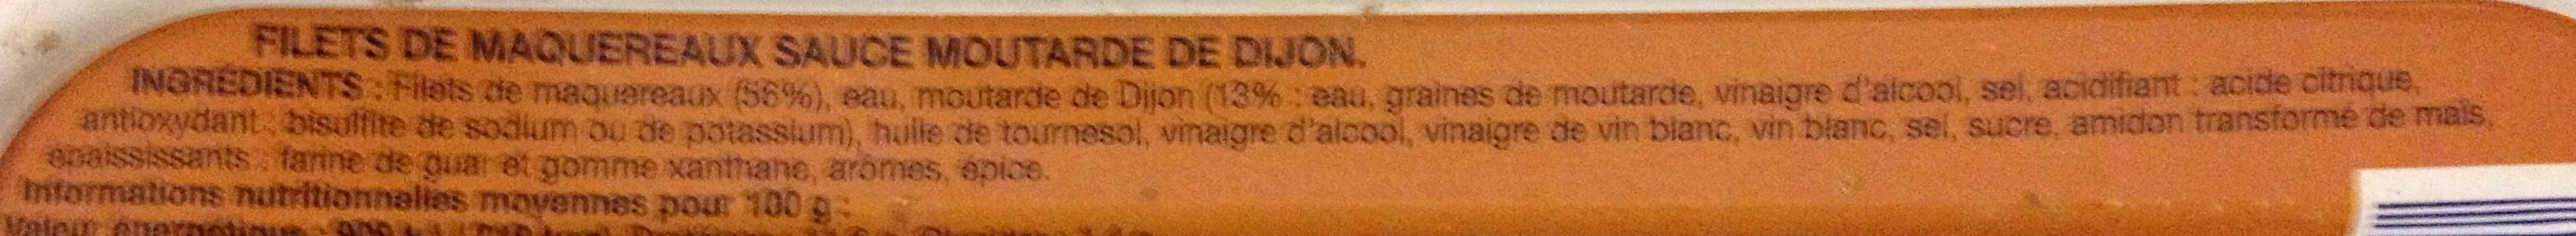 Filets de Maquereaux (Sauce Moutarde de Dijon) - Ingrediënten - fr